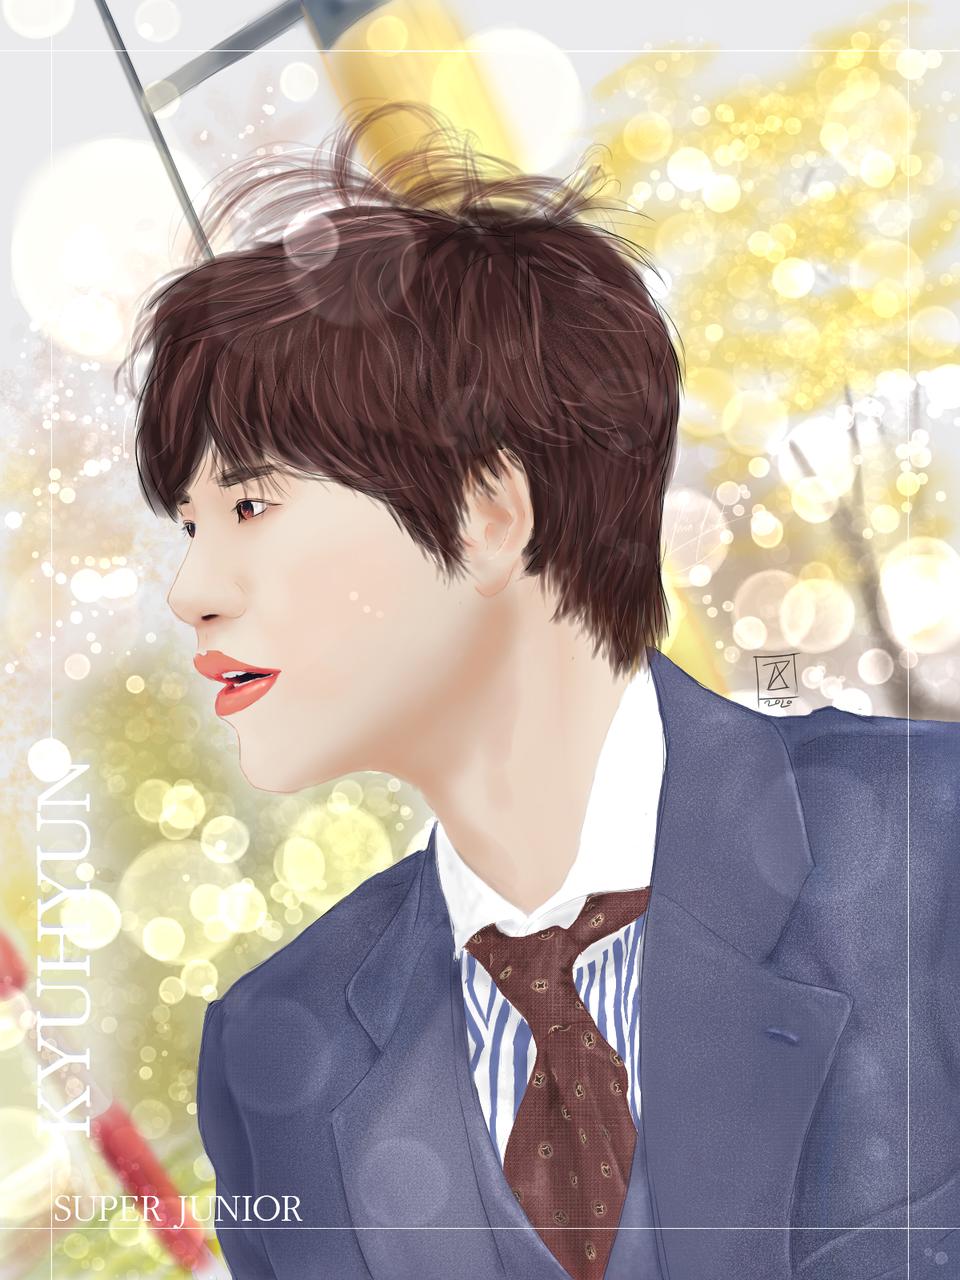 Cho Kyuhyun Illust of Aznty_09 boy illustration paisaje longhair Ilustration medibangpaint Kyuhyun Kpop SUPERJUNIOR